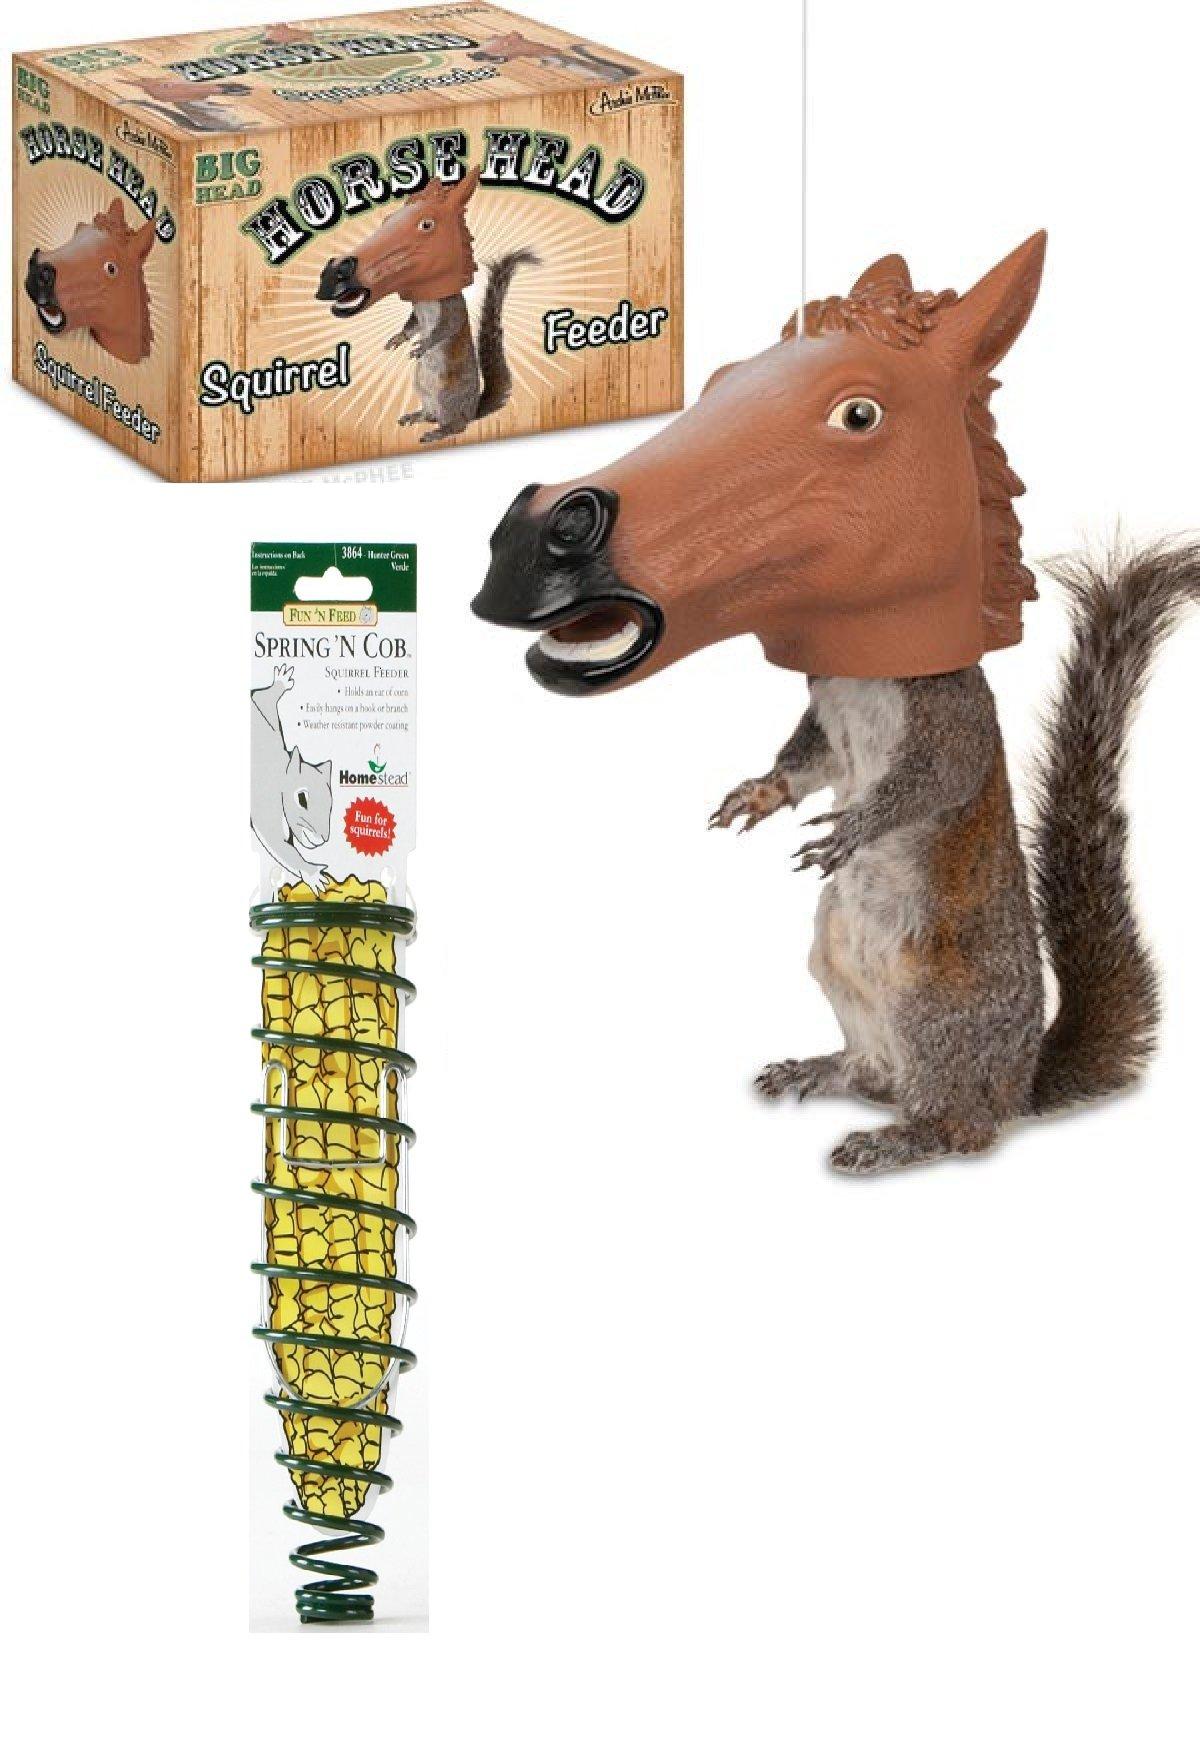 Squirrel Feeder Bundle with Horse head Squirrel feeder and Corn Cob Squirrel Feeder